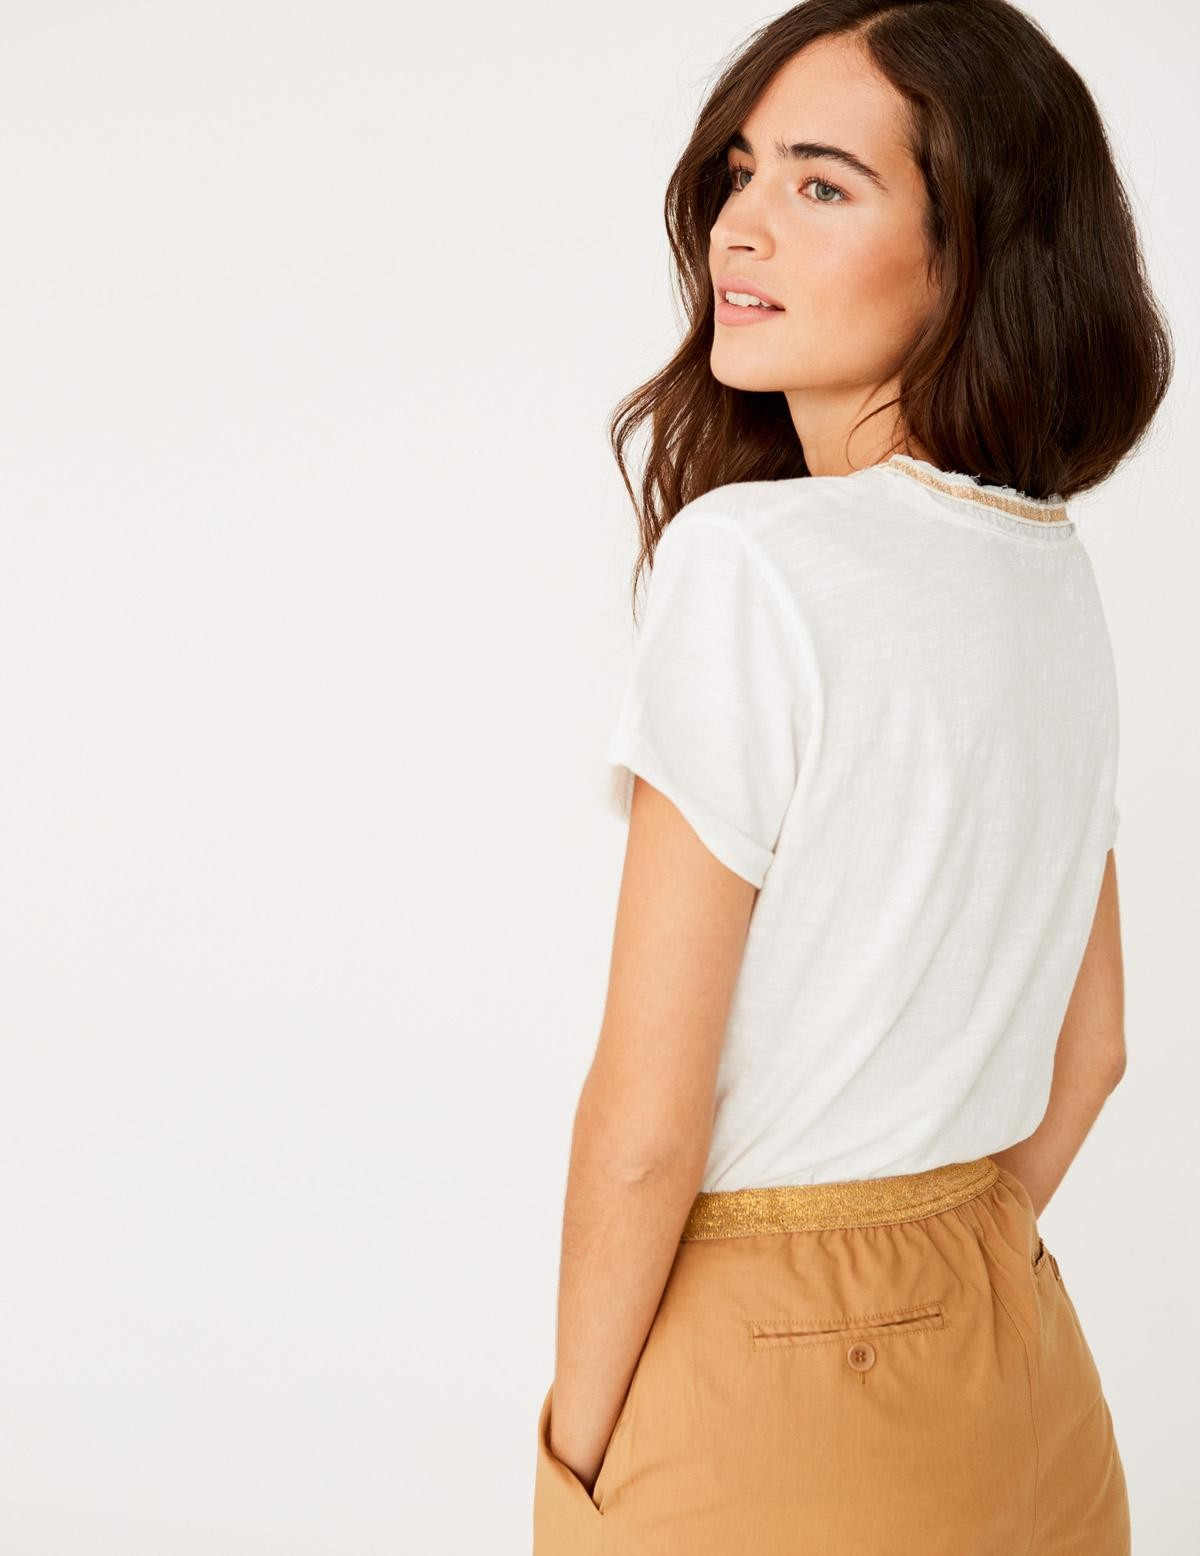 Camiseta cinta brillante - Ítem2